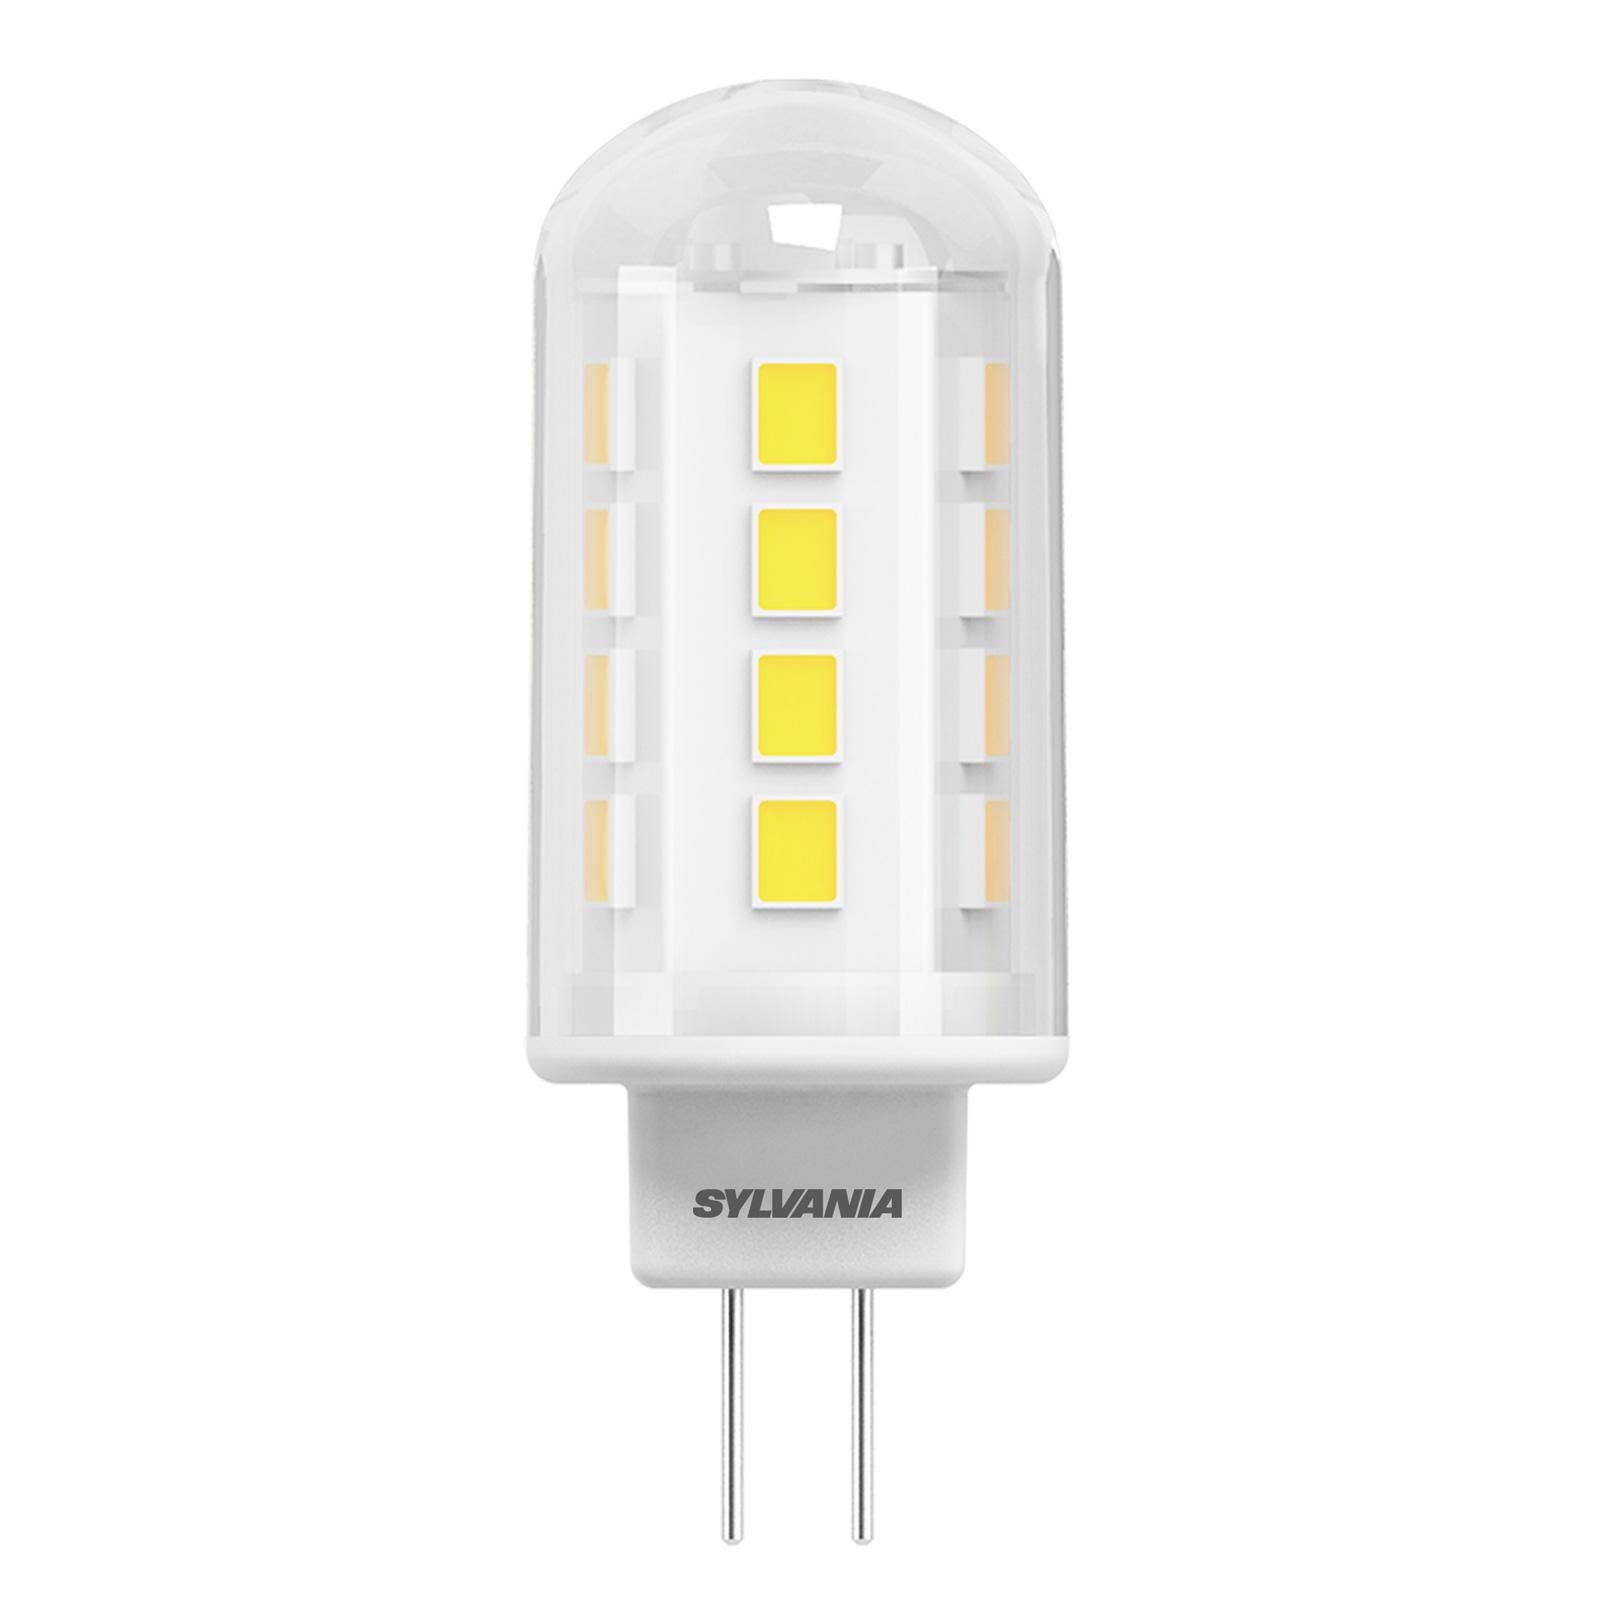 Ampoule broche LED ToLEDo G4 2,2W blanc chaud